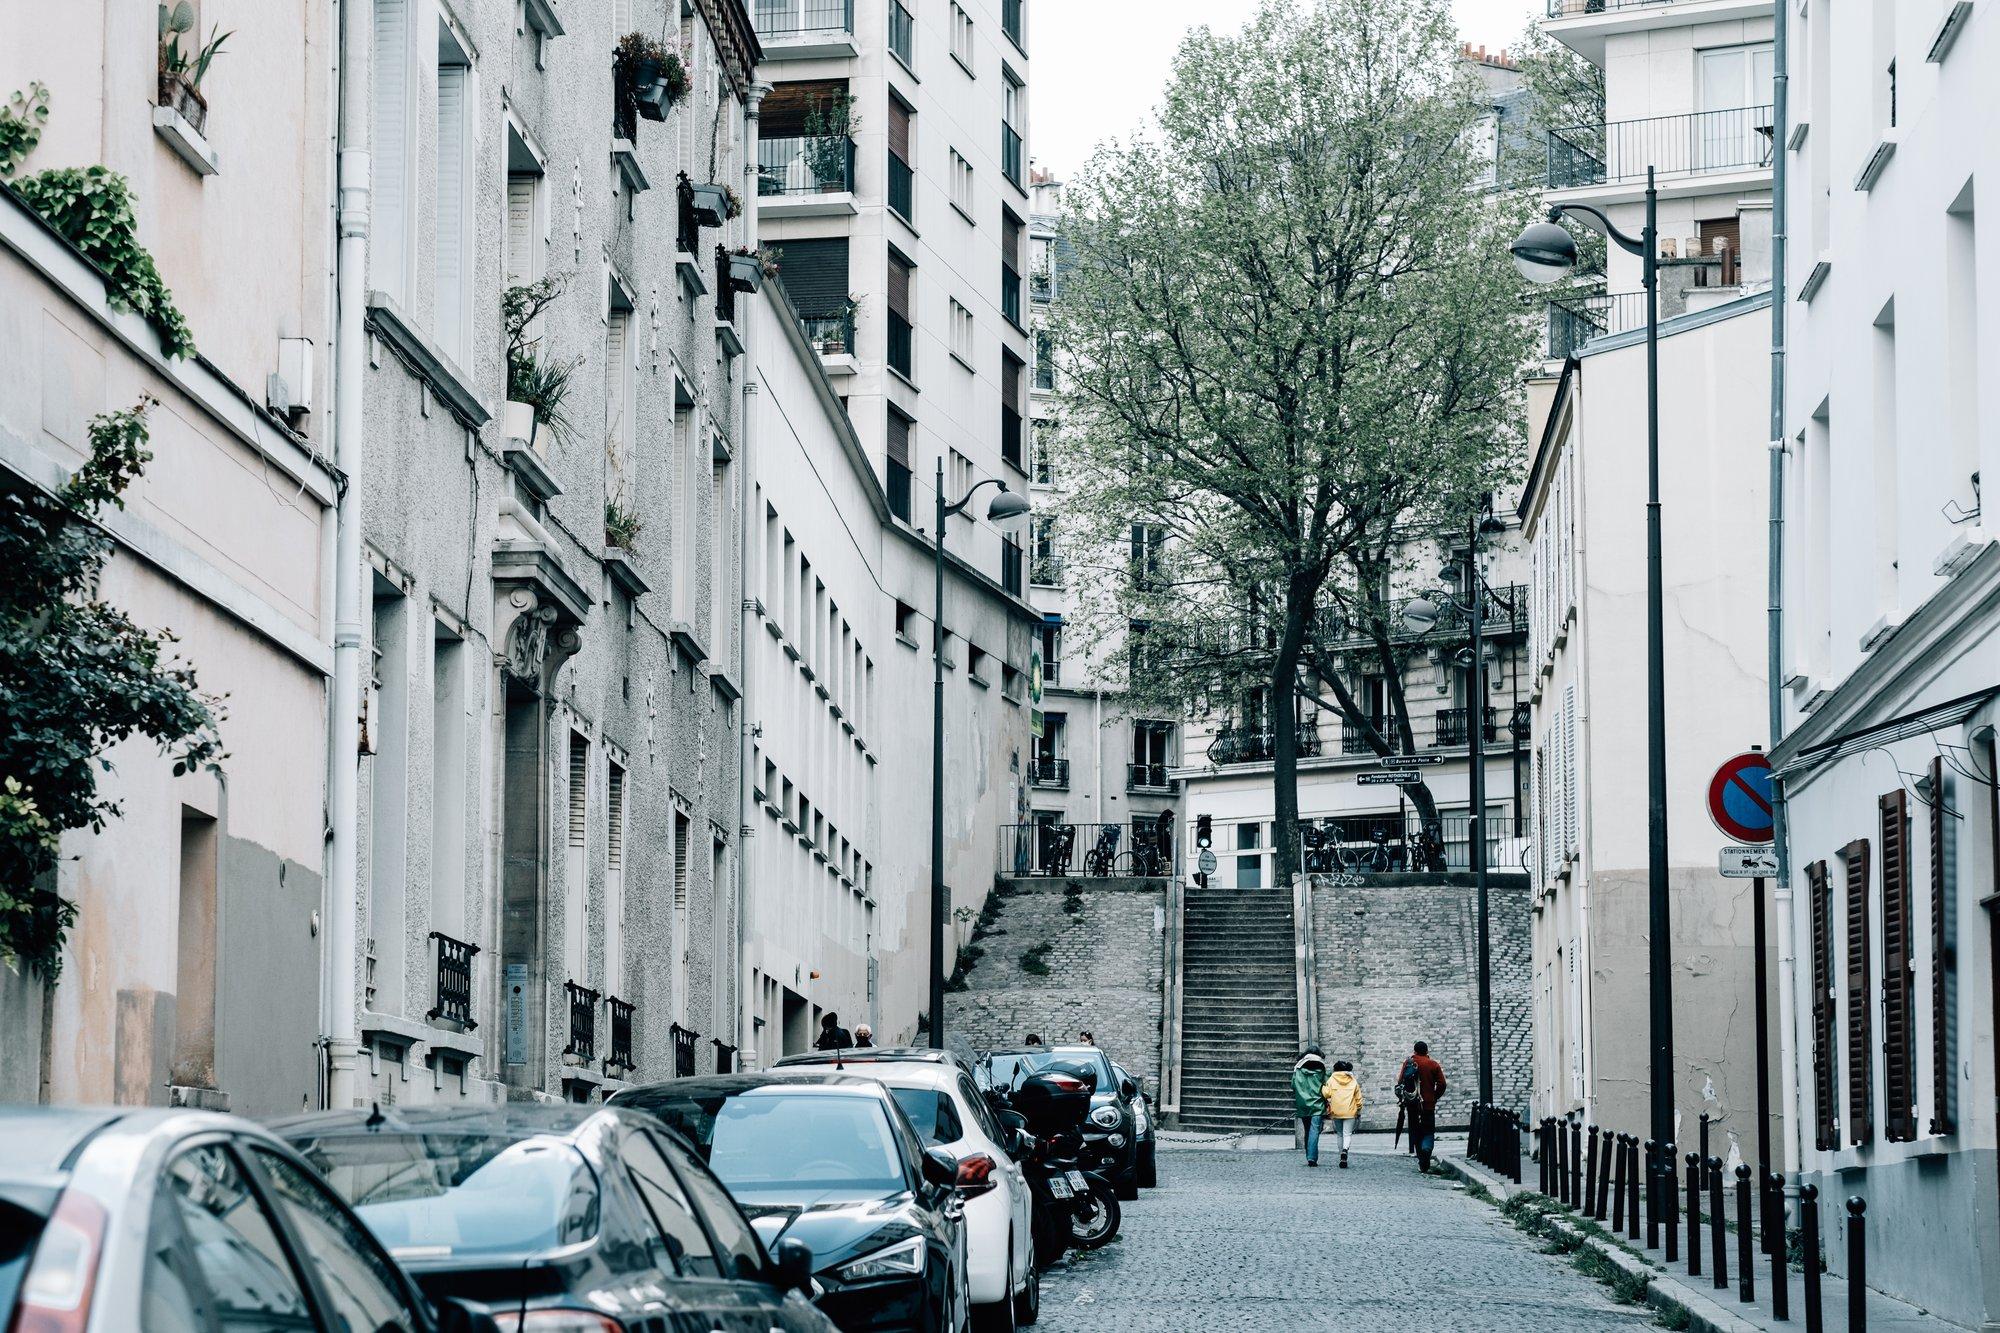 city street with cars and three pedestrians 有汽车和三个行人的城市街道